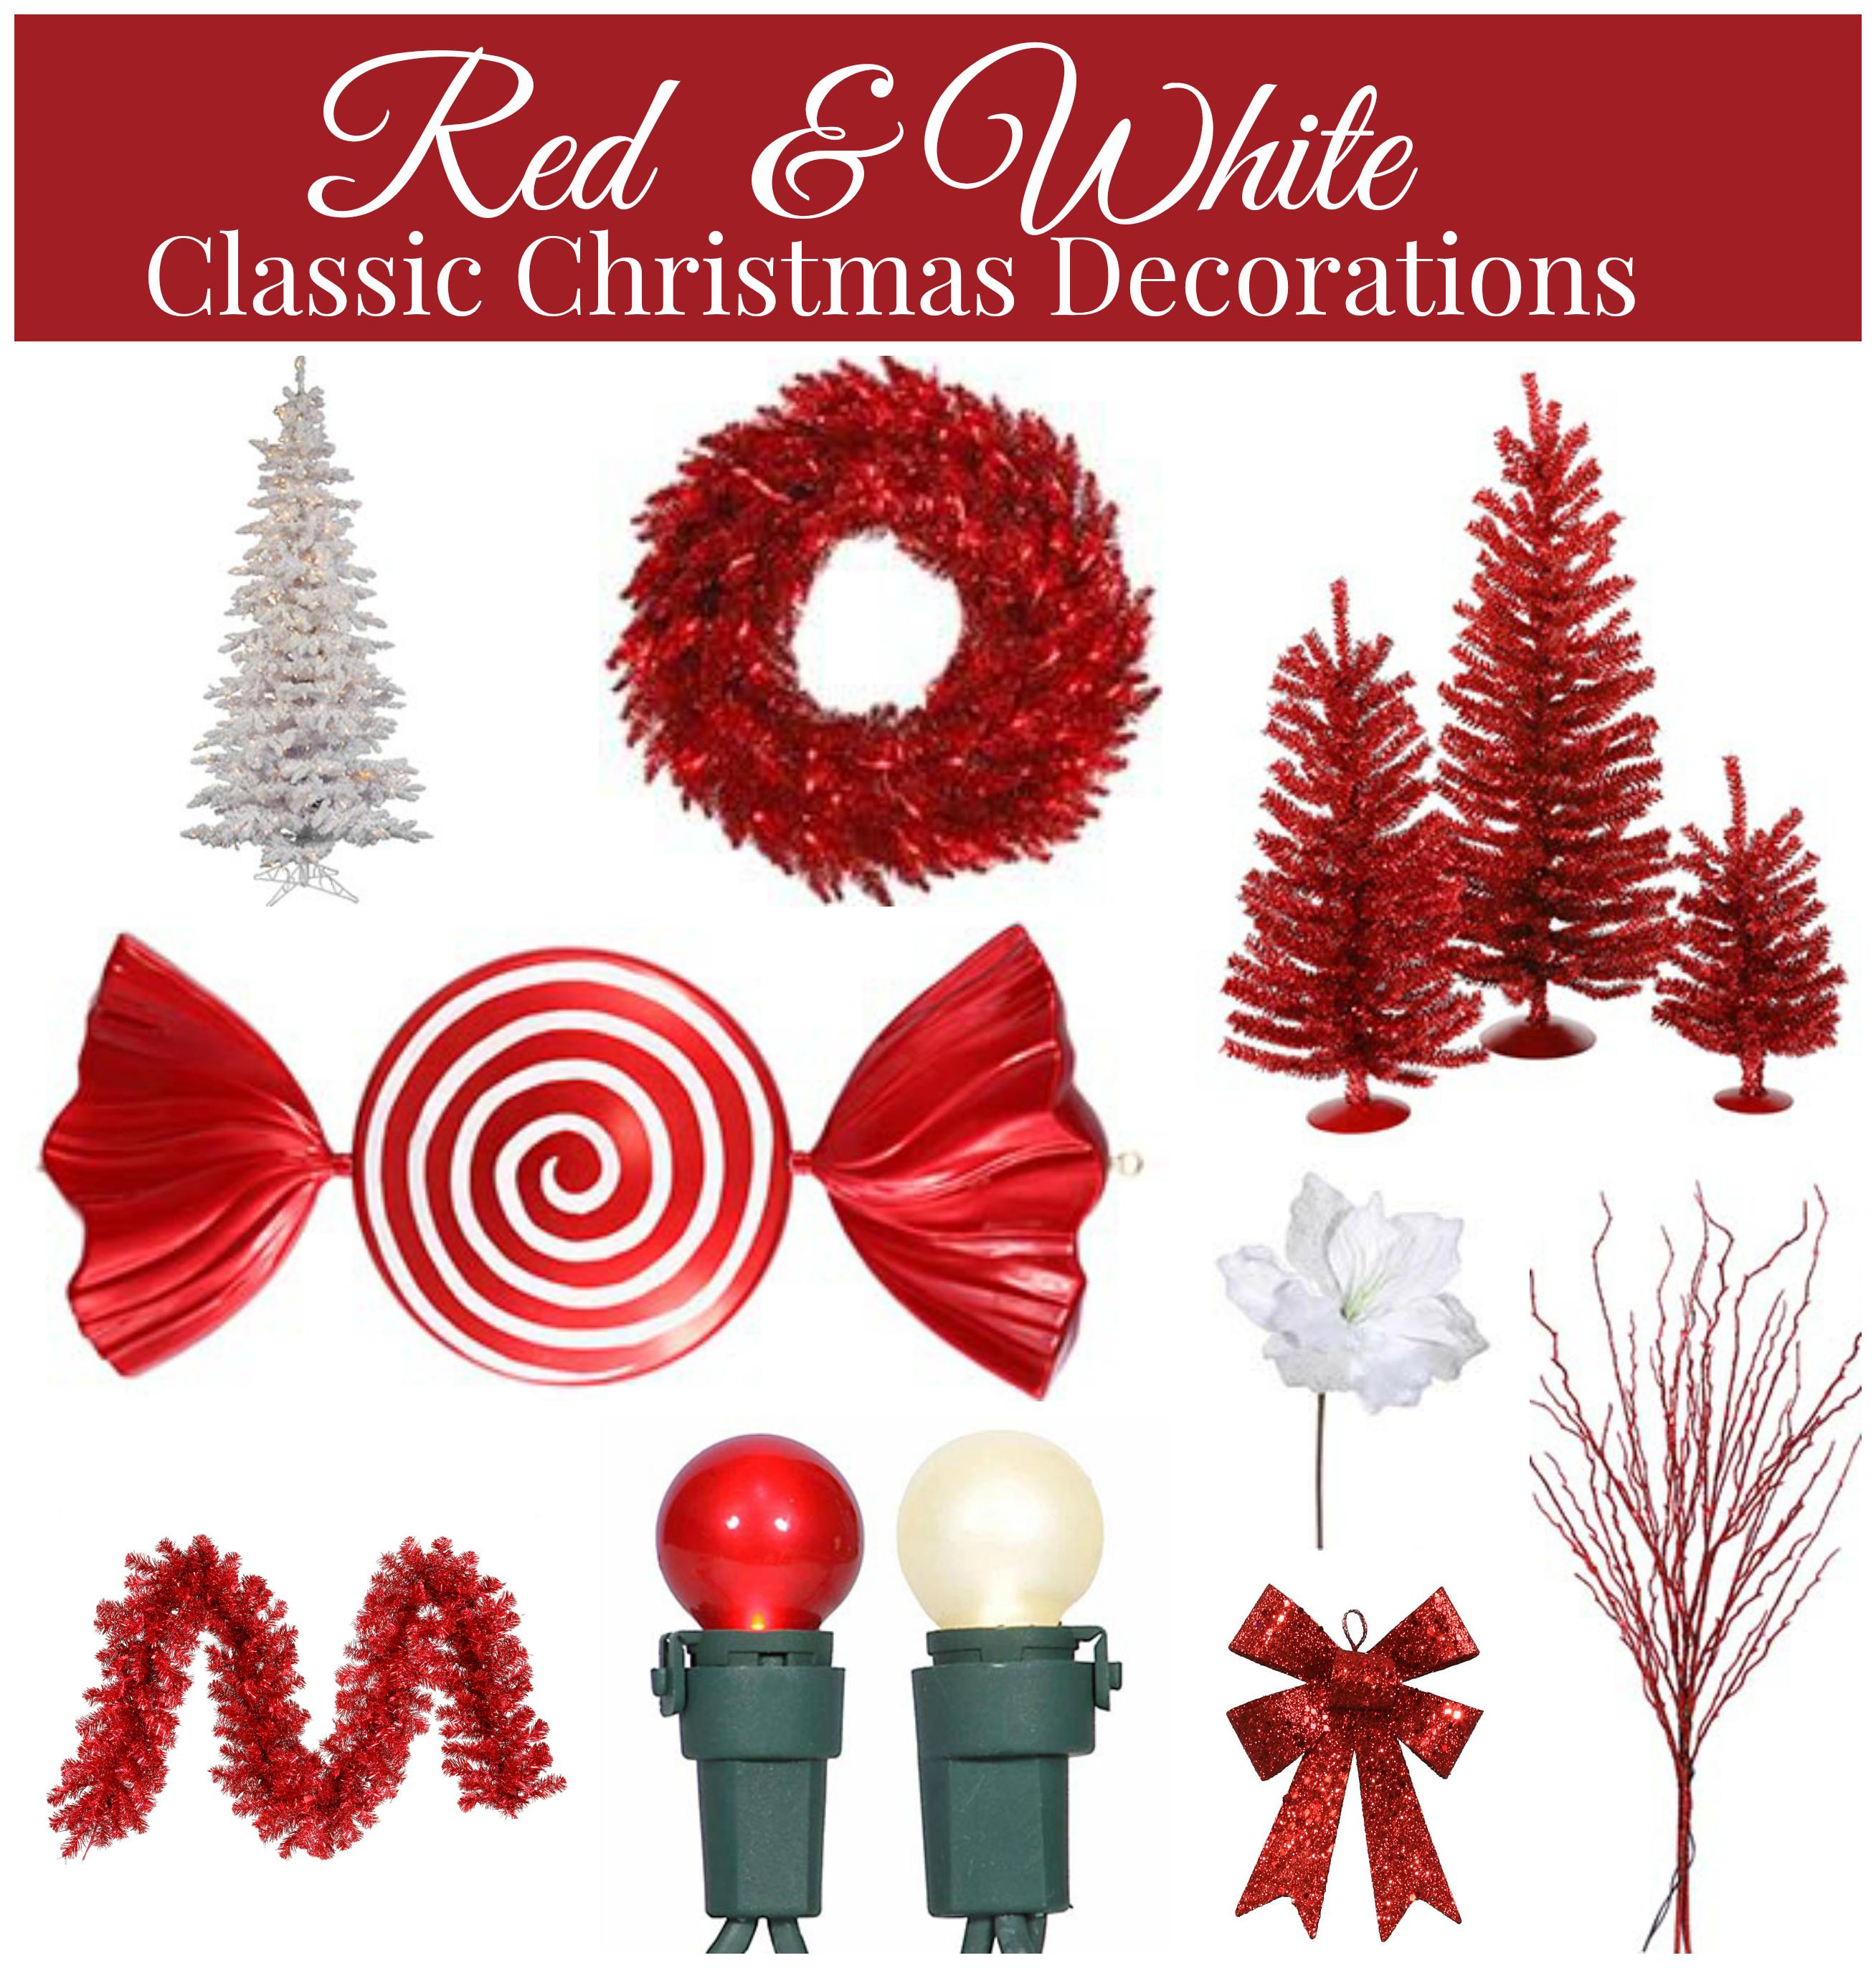 10 Artificial Christmas Trees